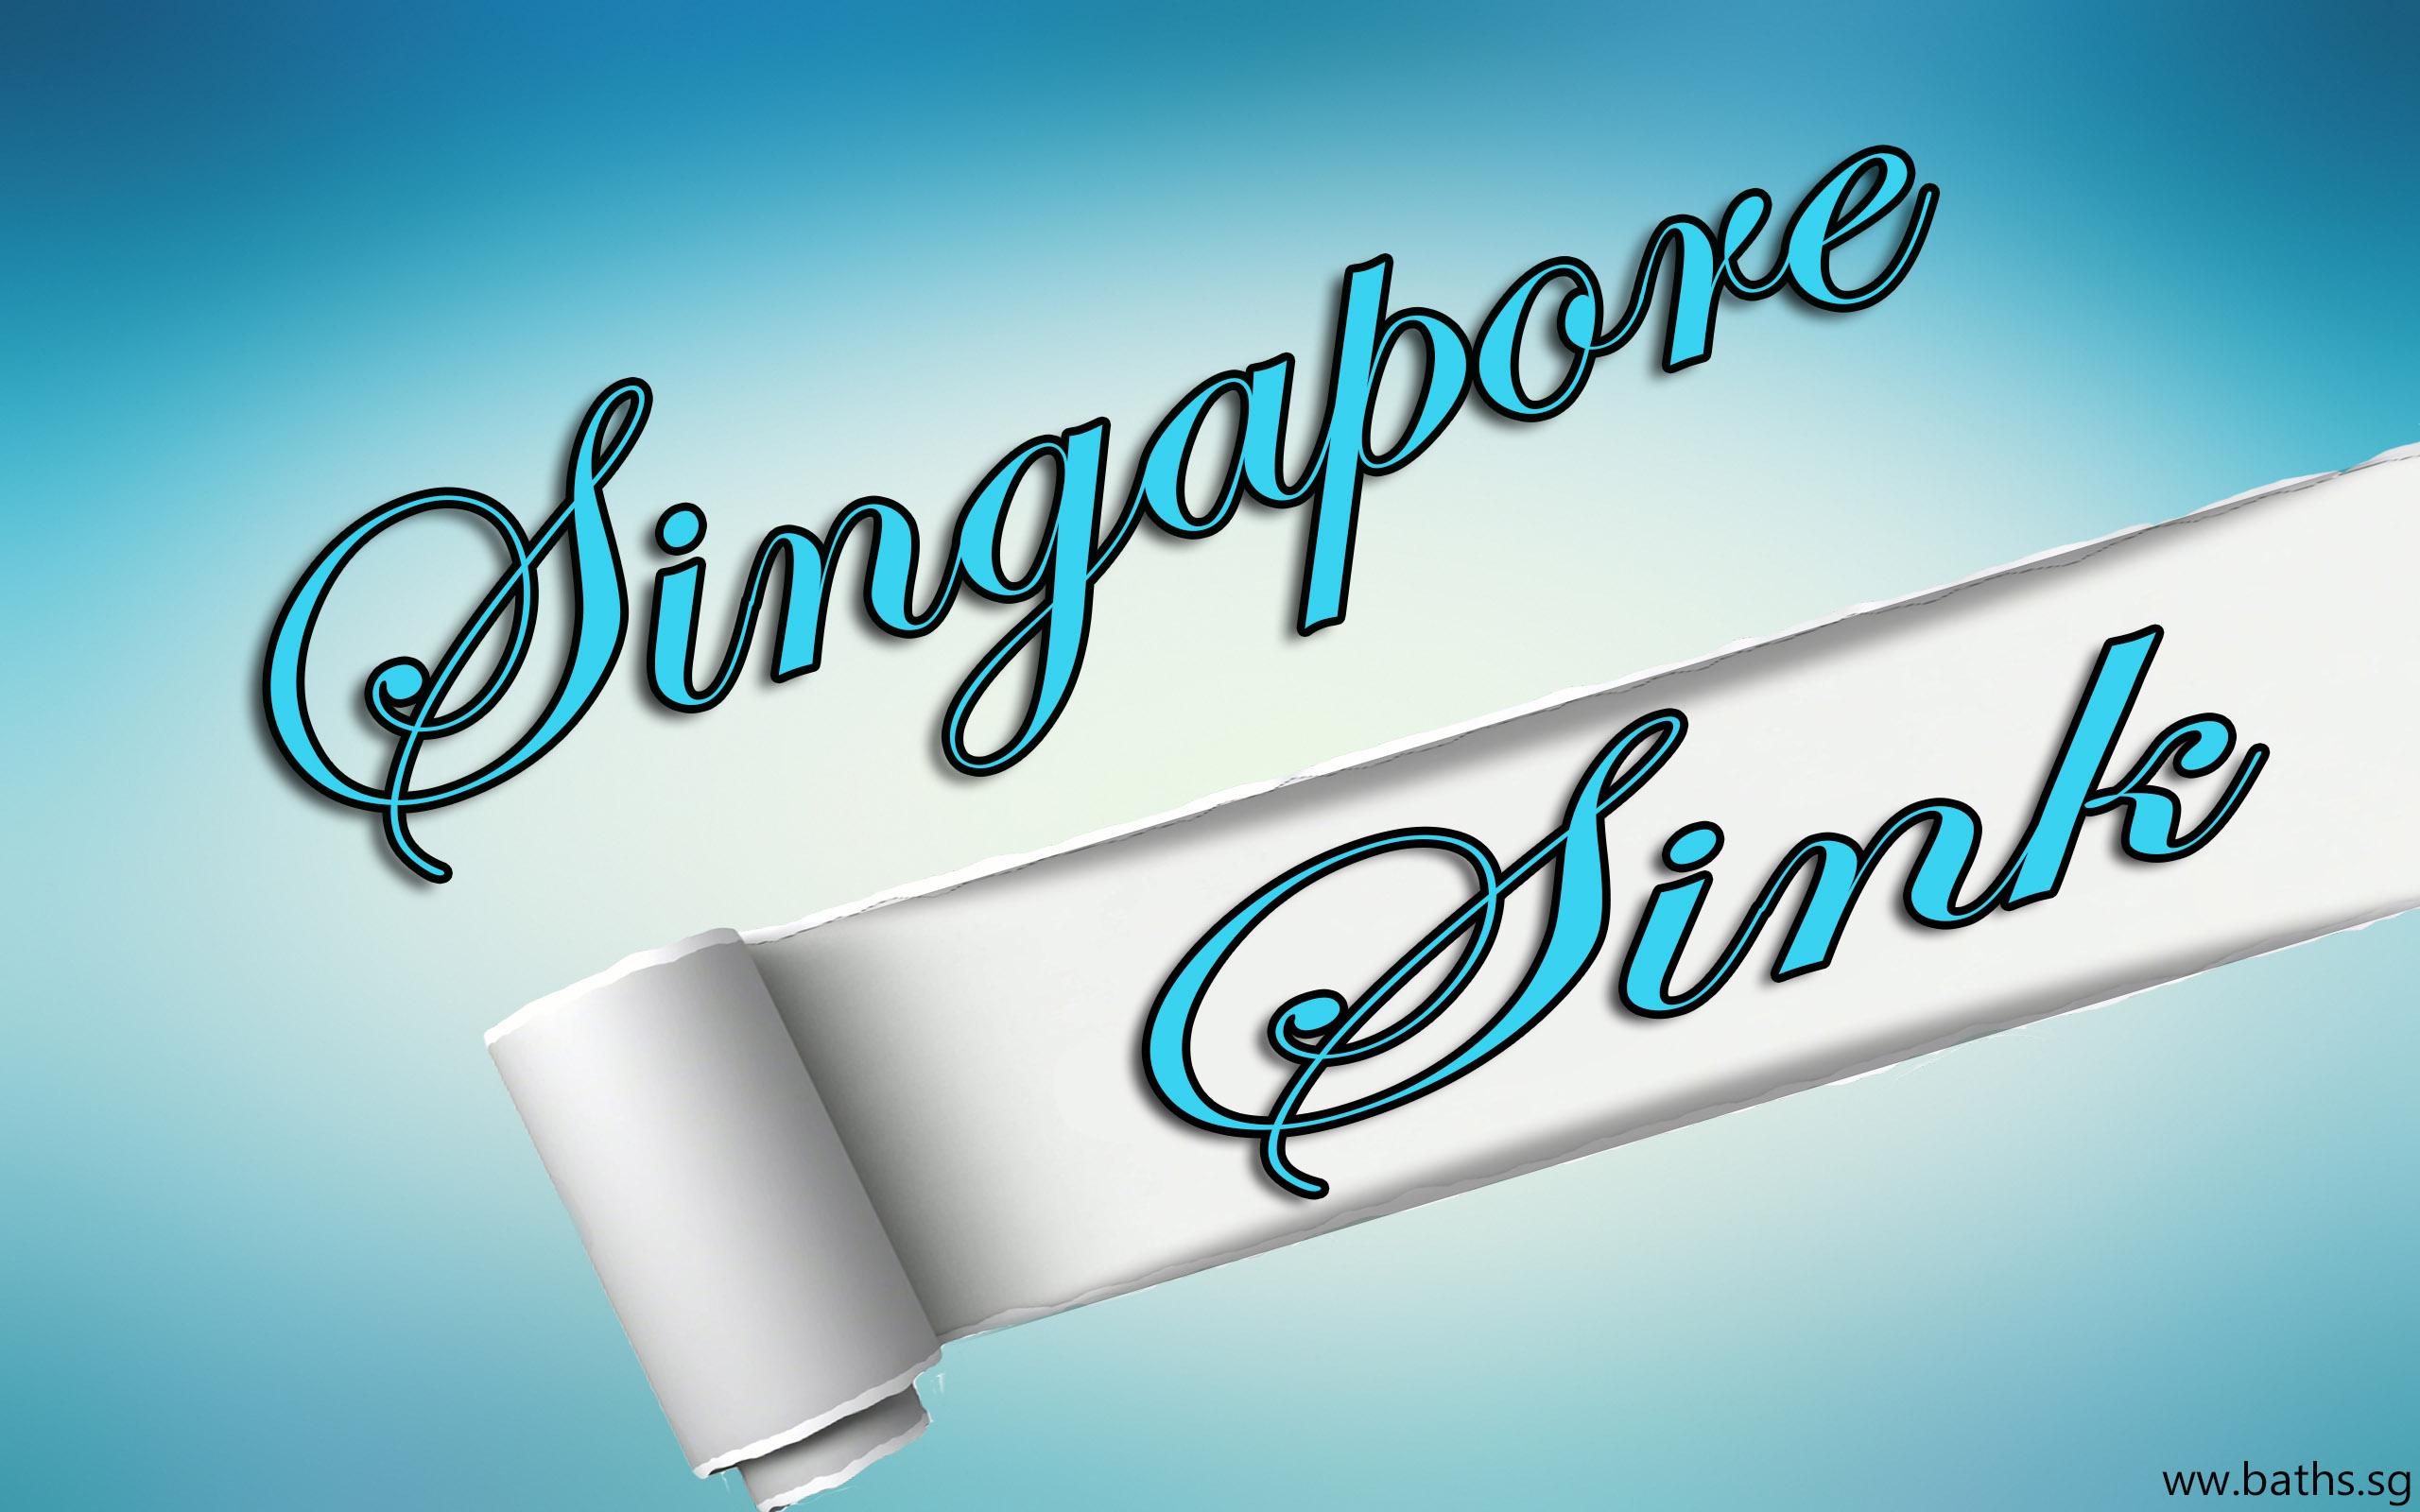 Bidet singapore